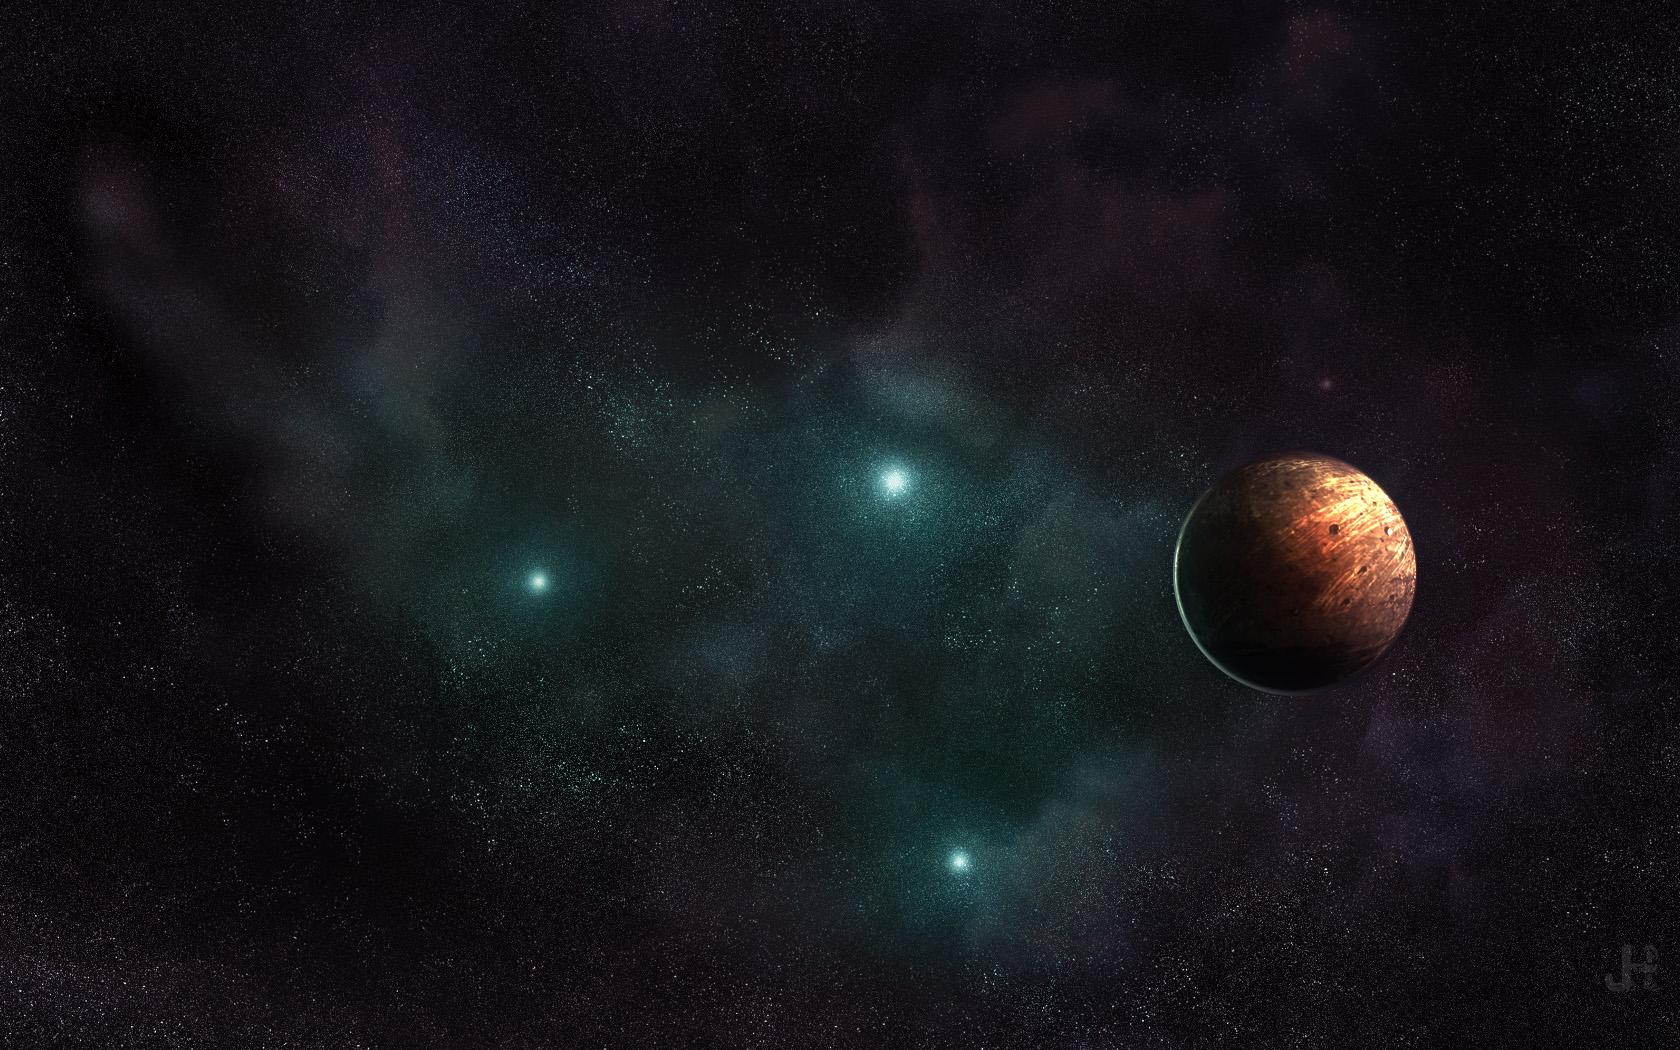 planet mars hd 1080p - photo #13